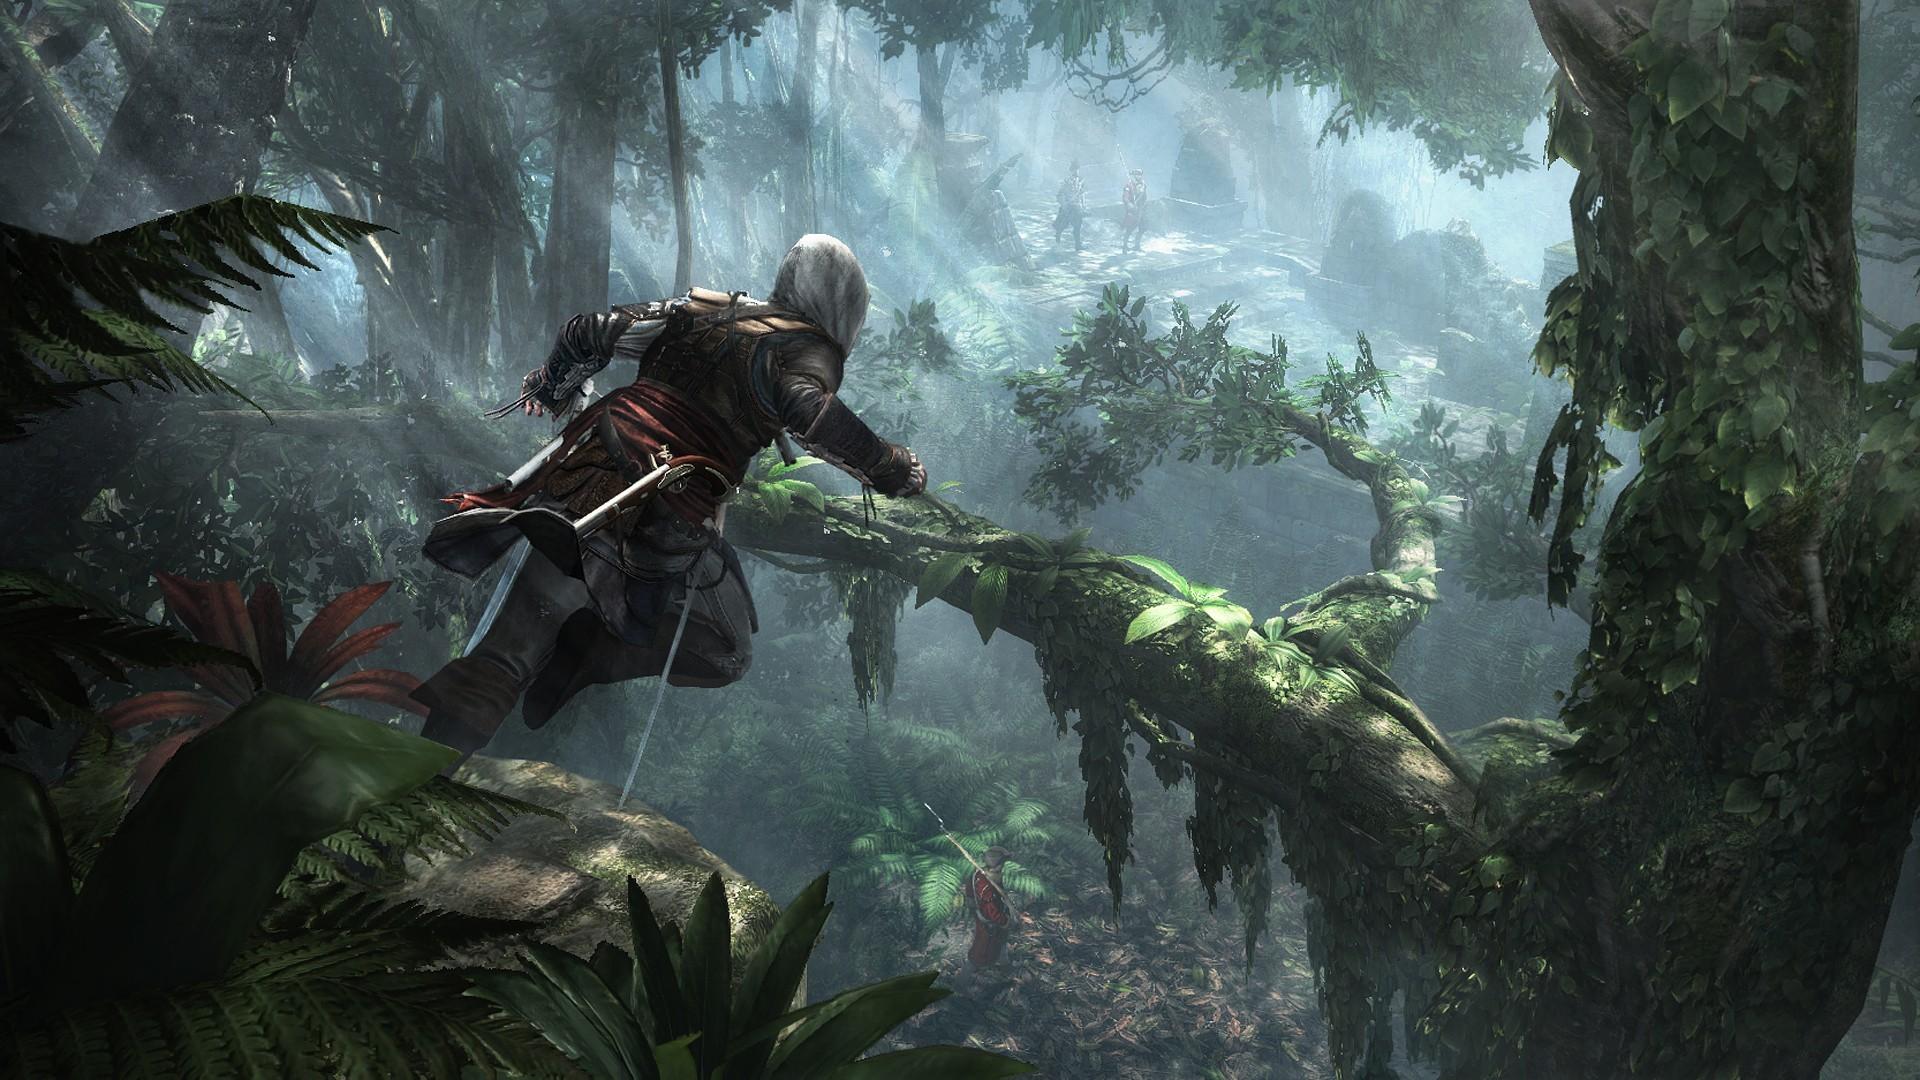 Report RSS Assassin's Creed IV: Black Flag Wallpaper (view original)